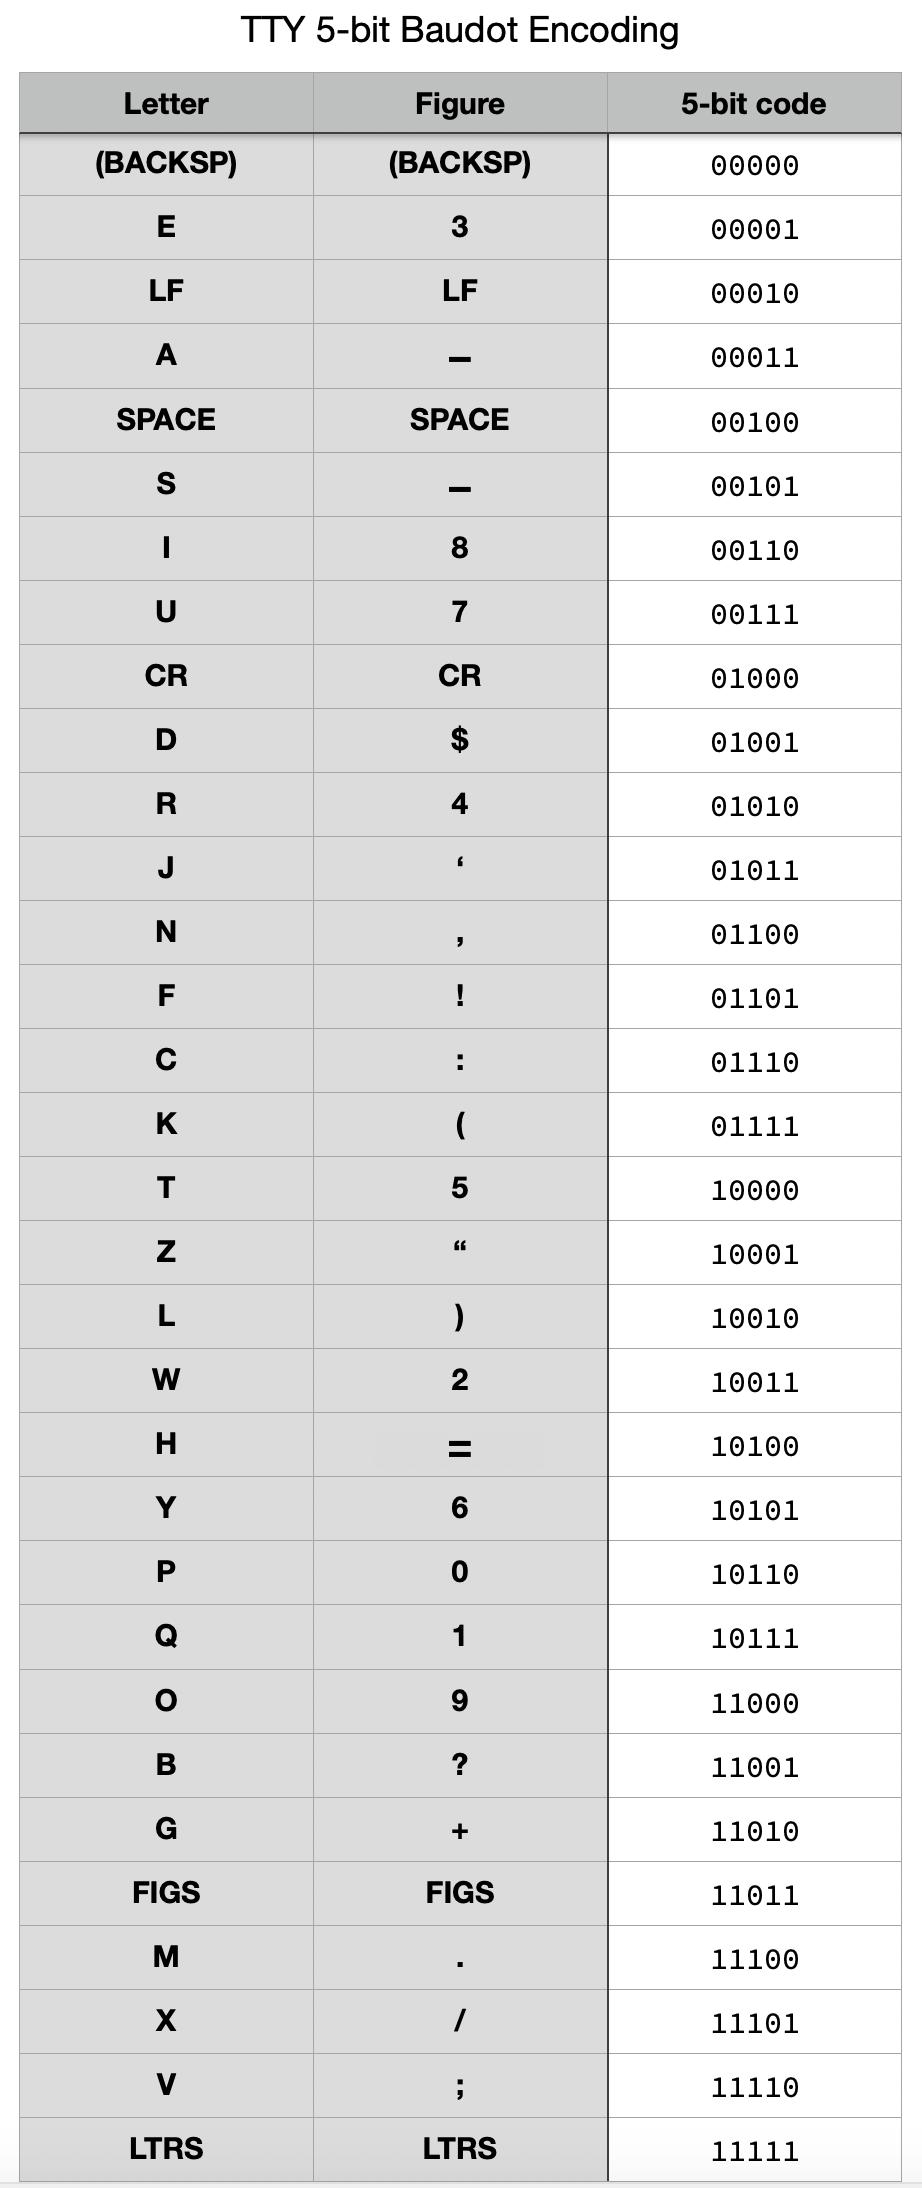 hacks_tty_chart.png